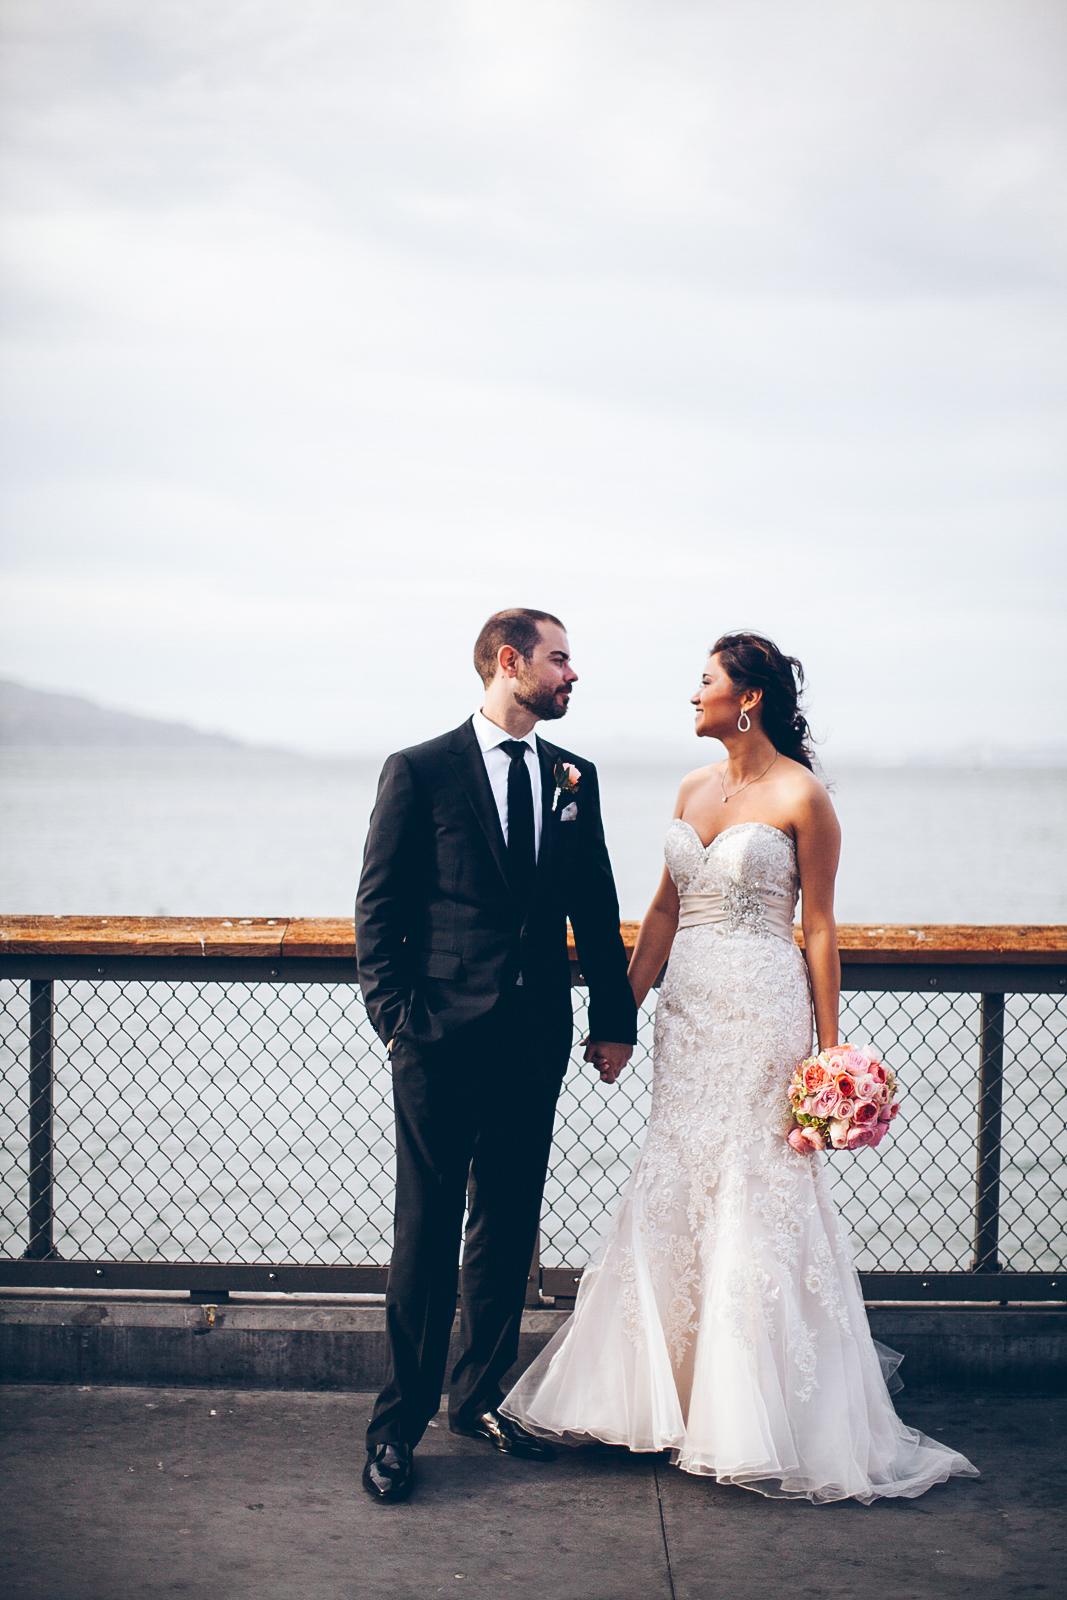 San_francisco_city_hall_wedding_photography_meegan_travis_ebony_siovhan_bokeh_photography_86.jpg